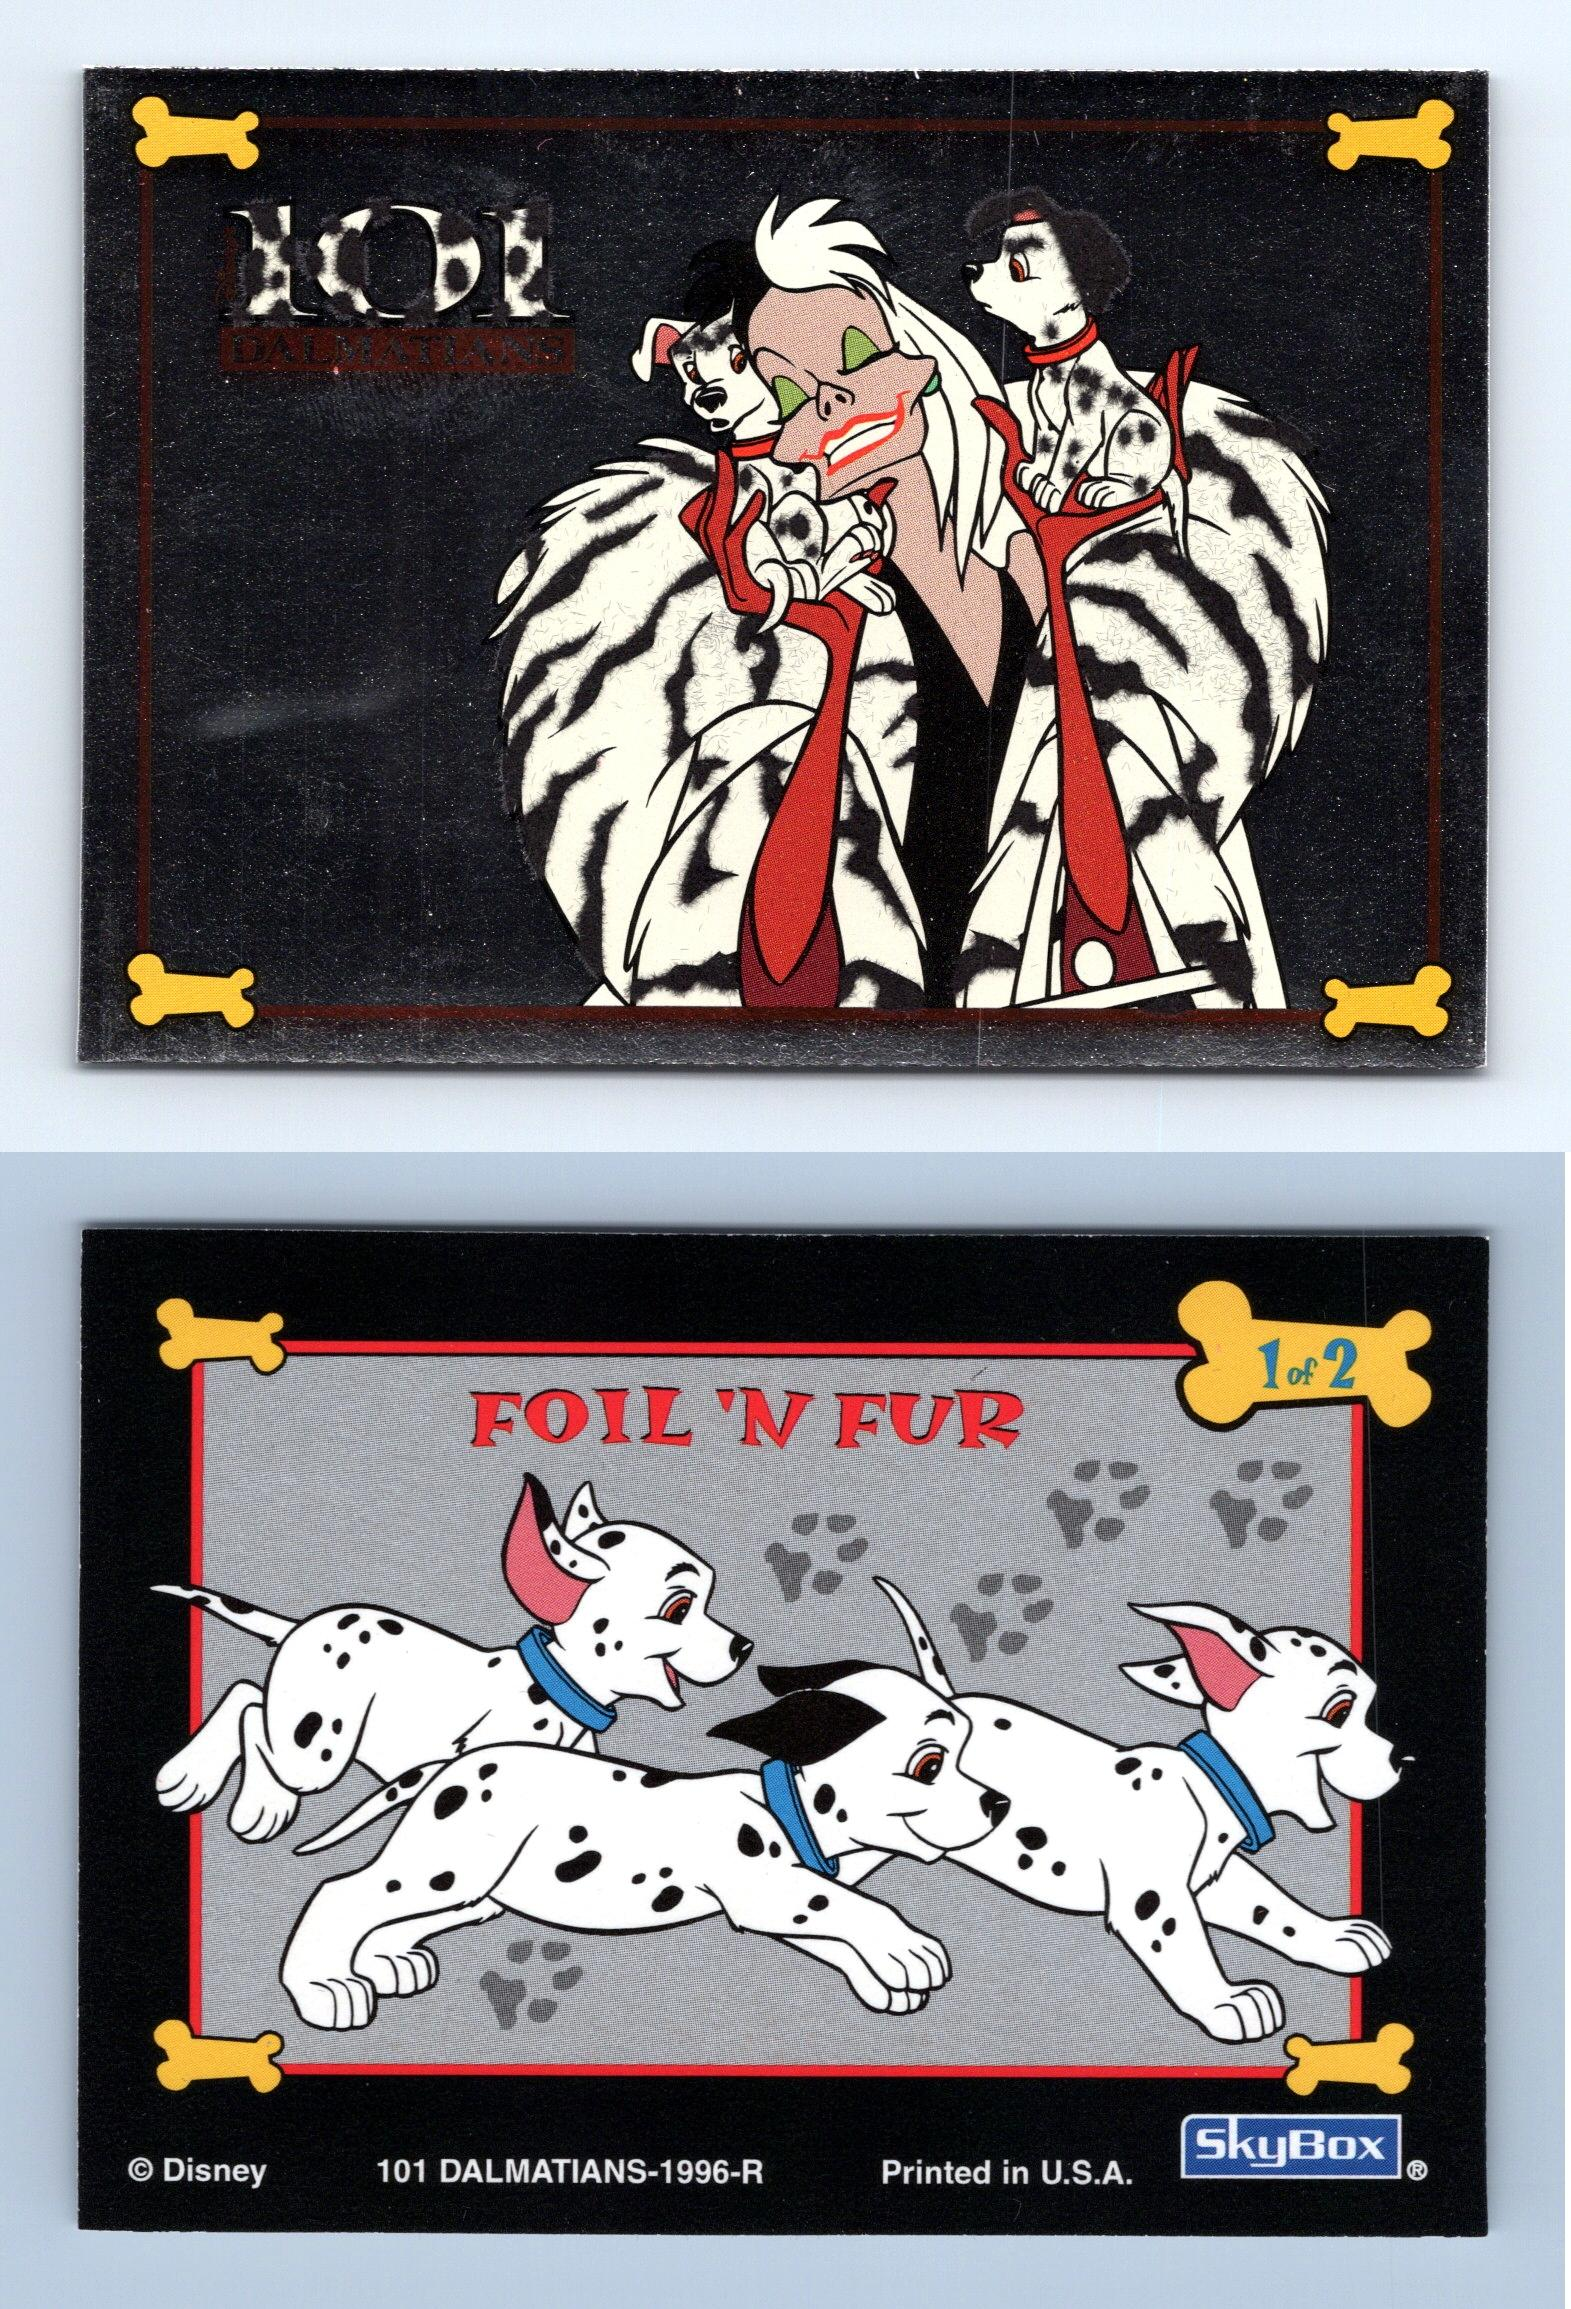 Foil N Fur 1 Of 2 Disney 101 Dalmatians 1996 Skybox Trading Card